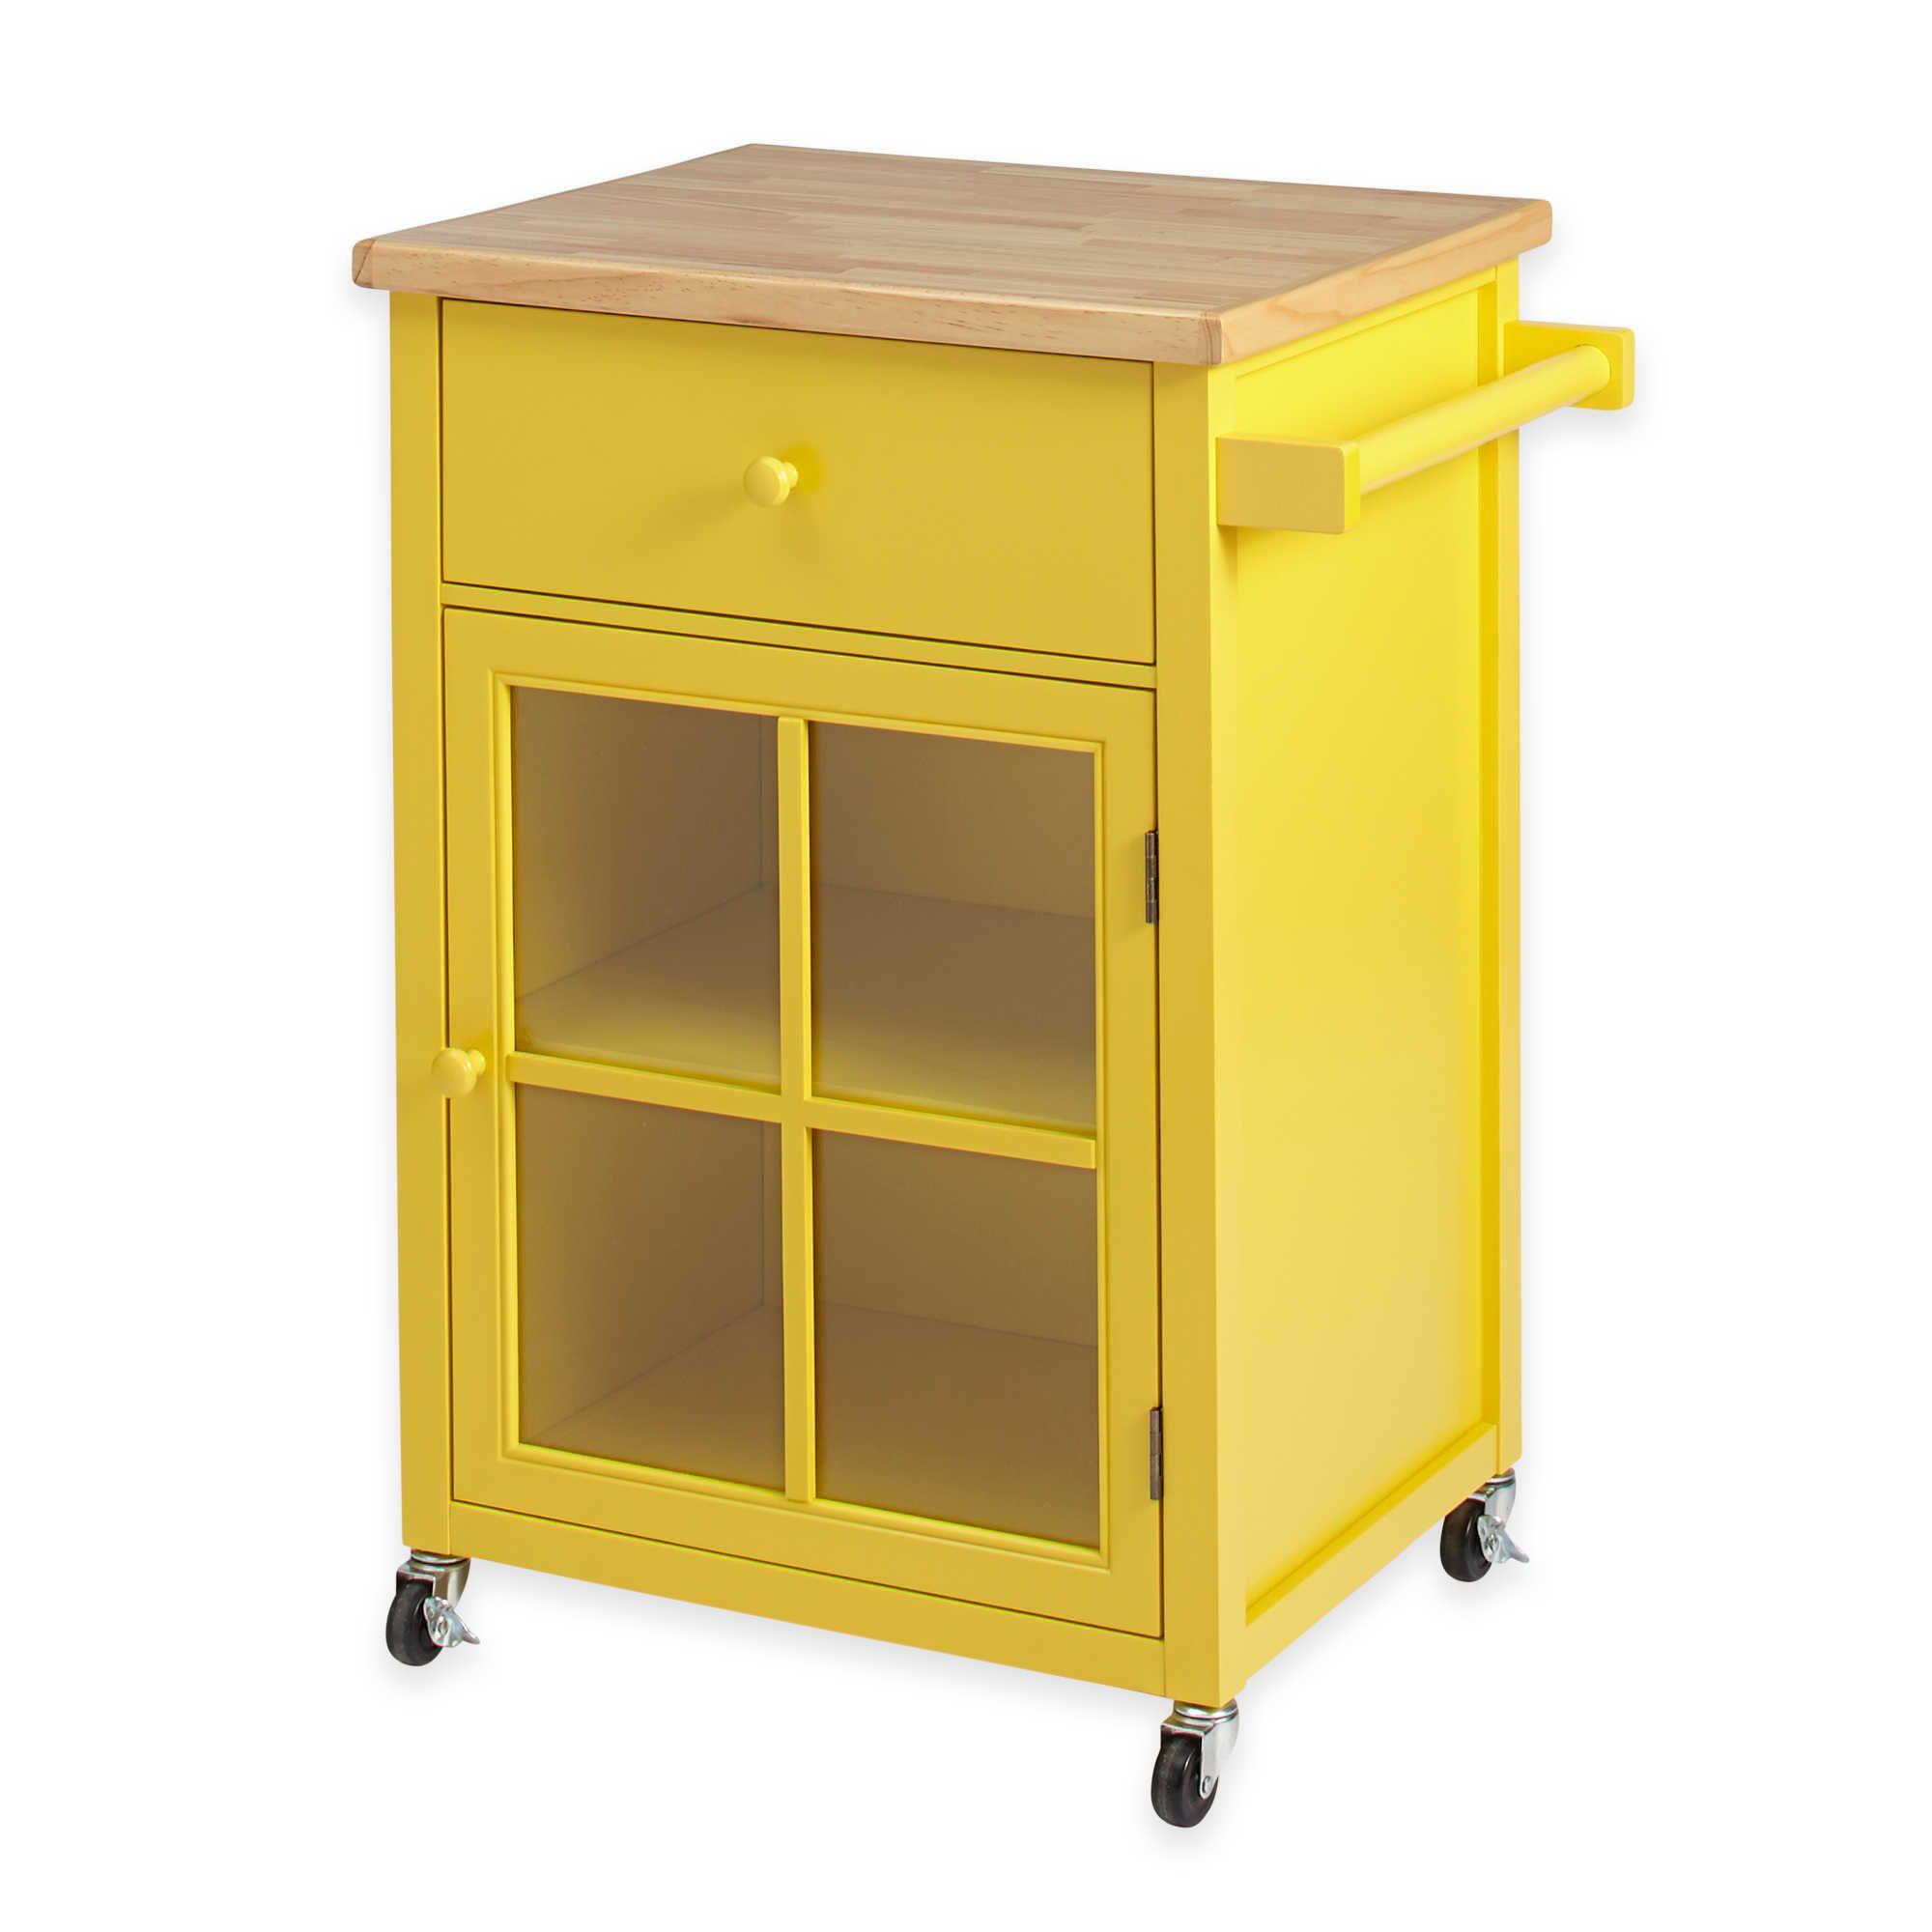 Chatham House Baldwin Kitchen Cart in Yellow Fun Pinterest